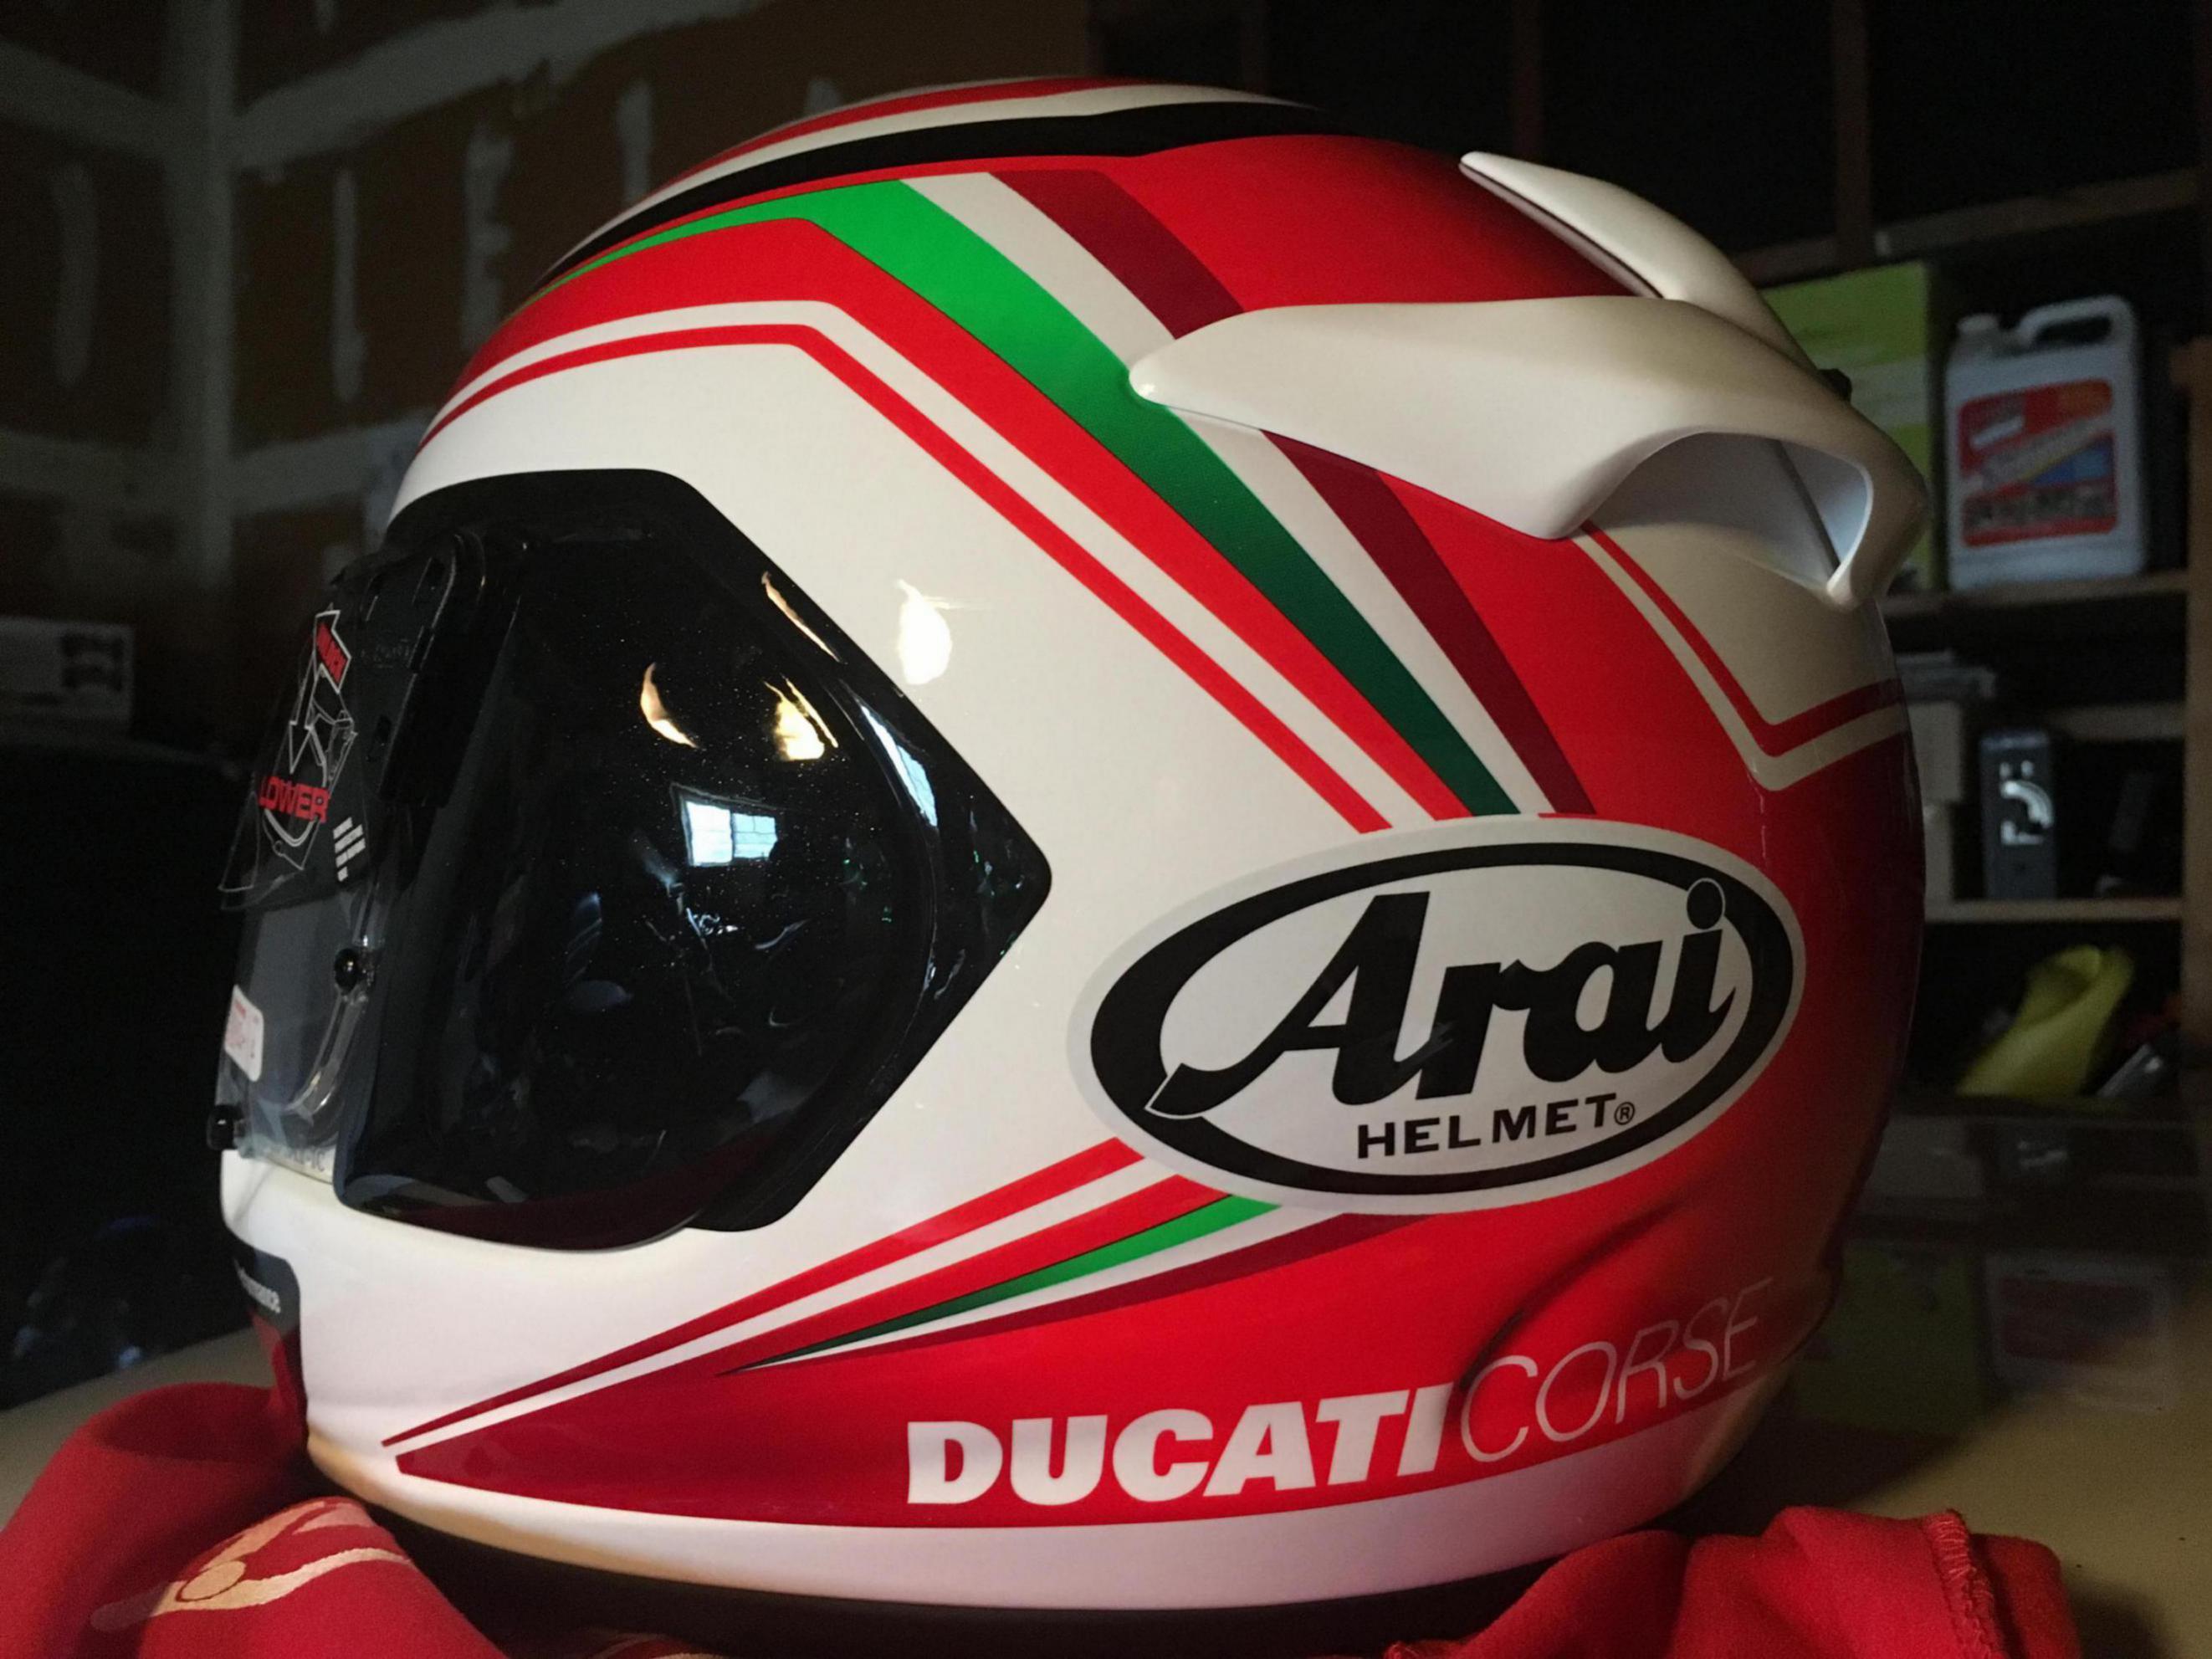 Arai Ducati SBK 2 corse large-img_2646_1528551099364.jpg